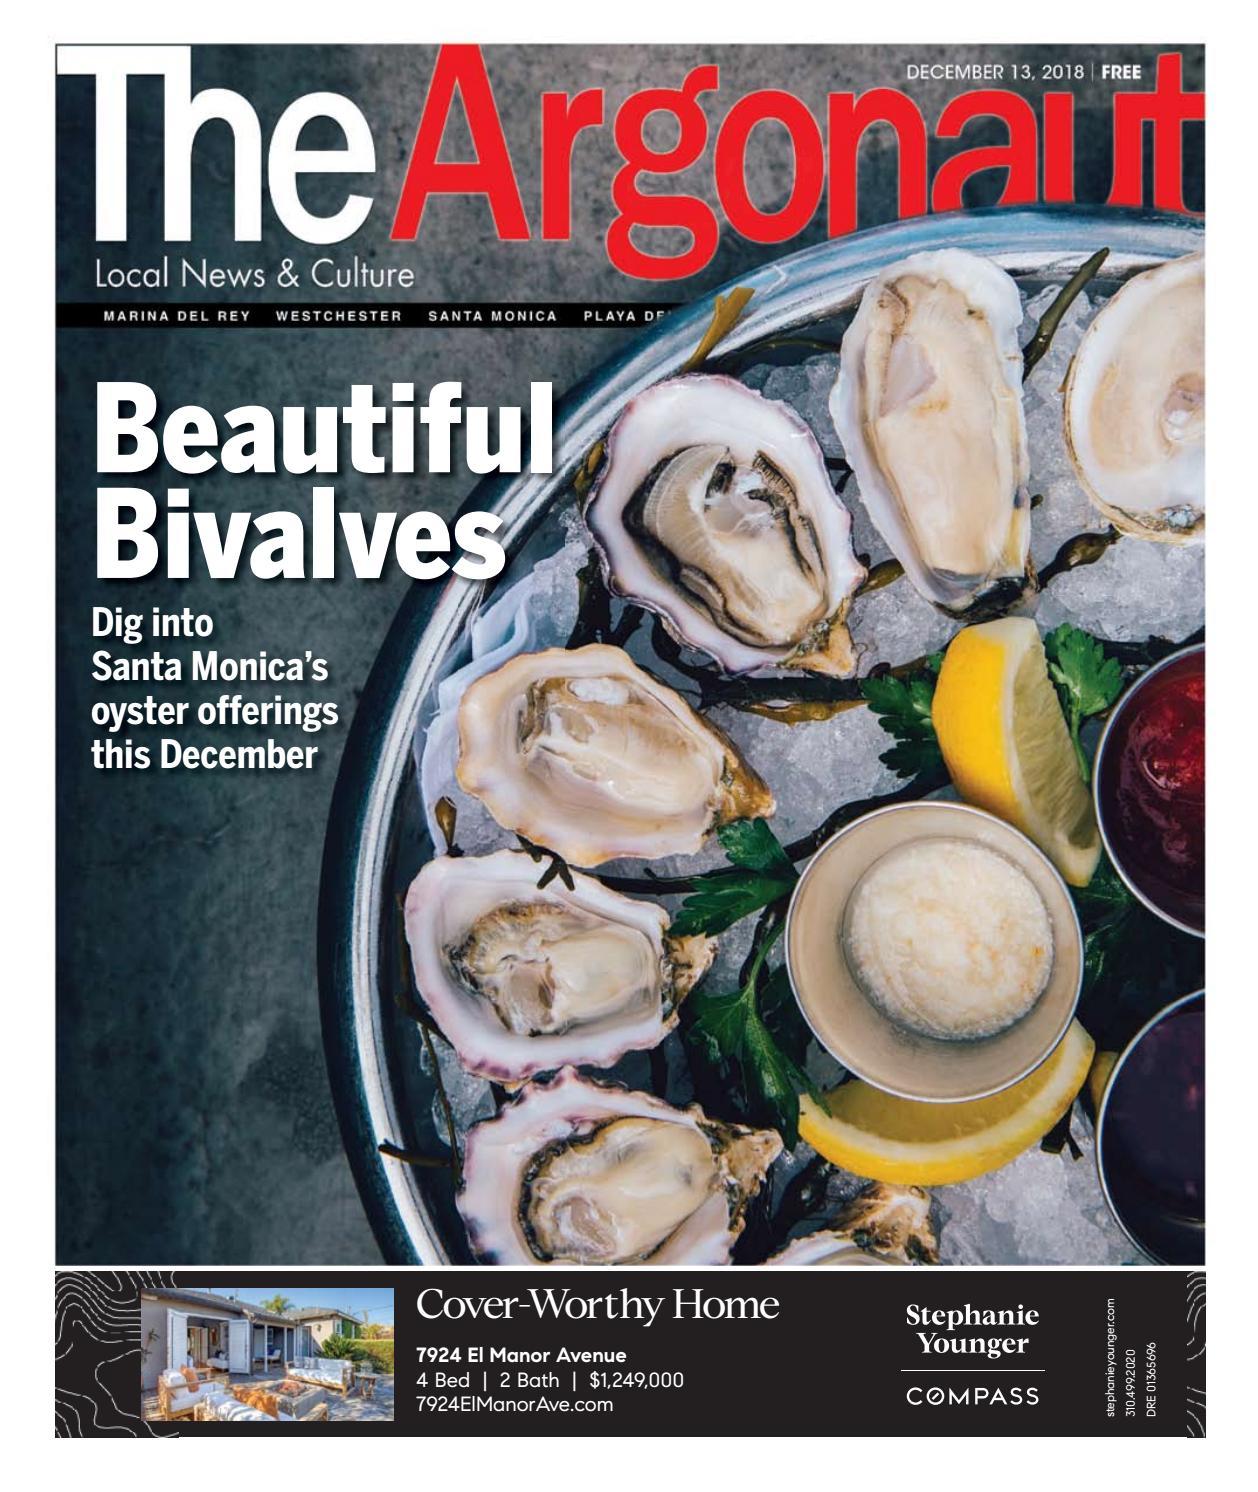 4494ce5bdd31b The Argonaut Newspaper December 13, 2018 by Kate - issuu